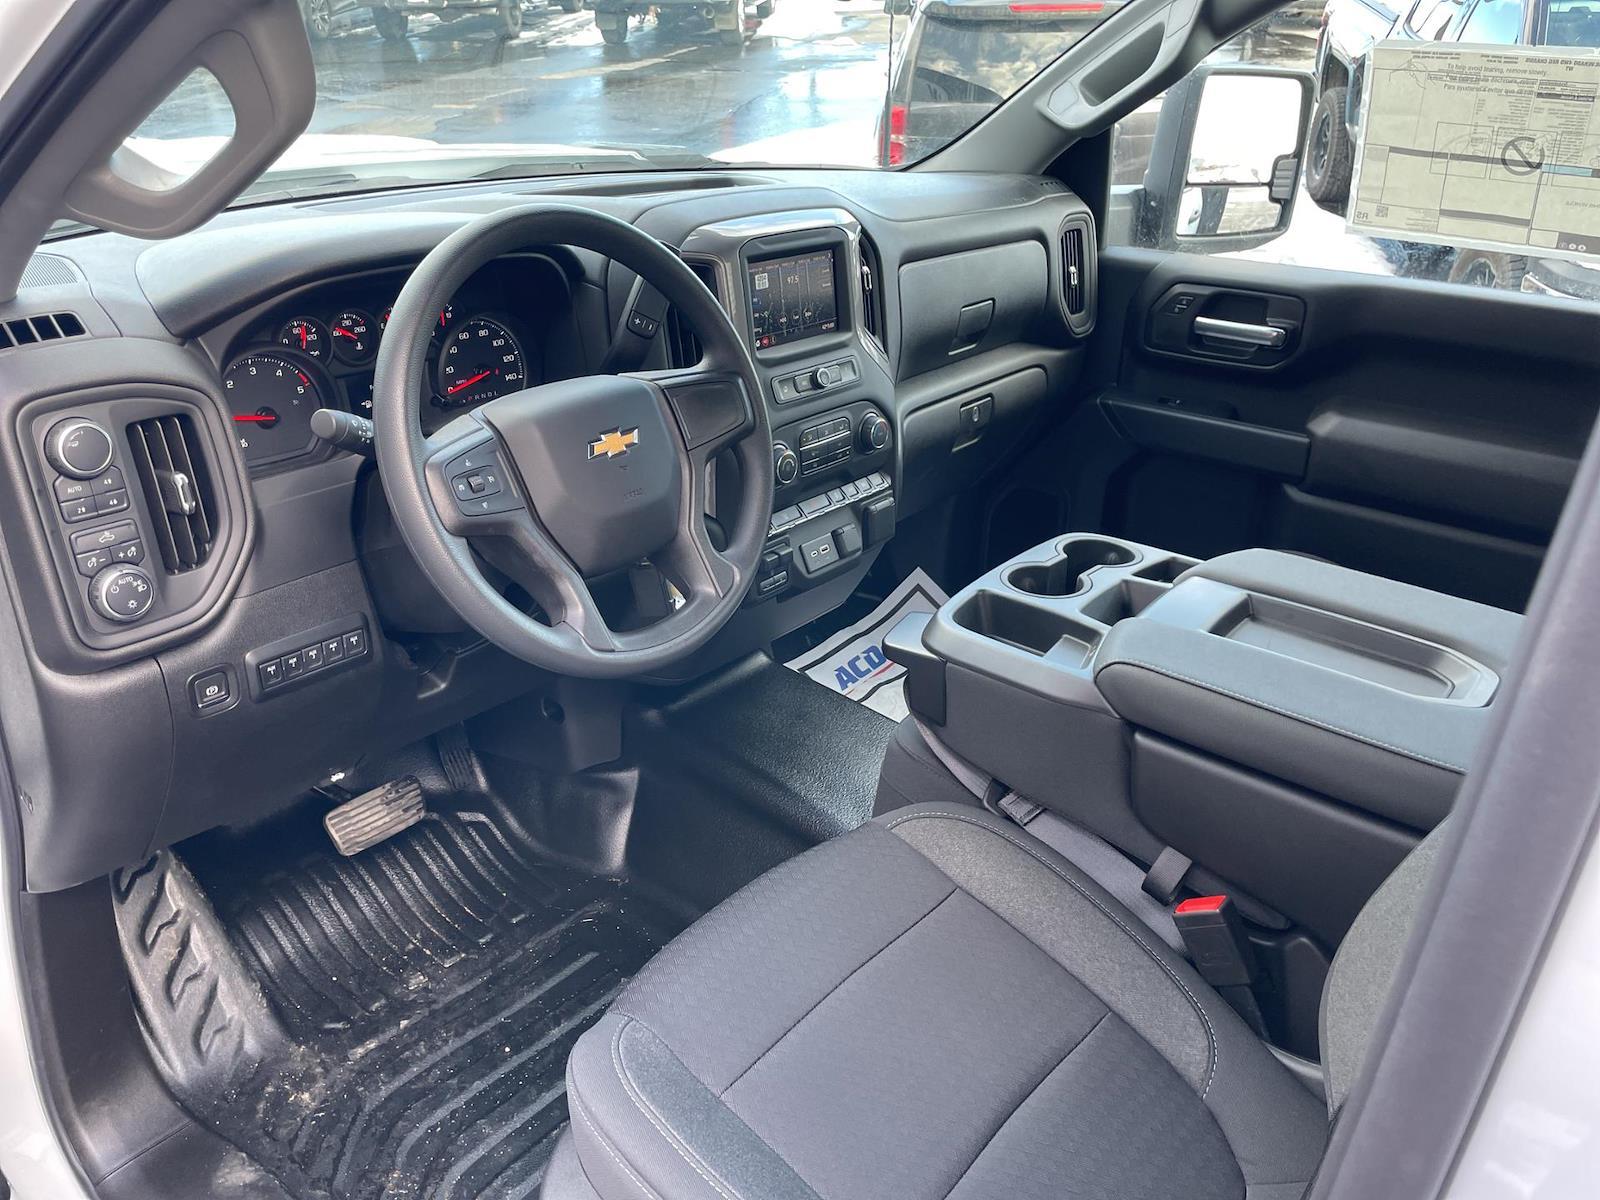 2021 Chevrolet Silverado 3500 Regular Cab AWD, Knapheide PGND Gooseneck Hauler Body #143979 - photo 9